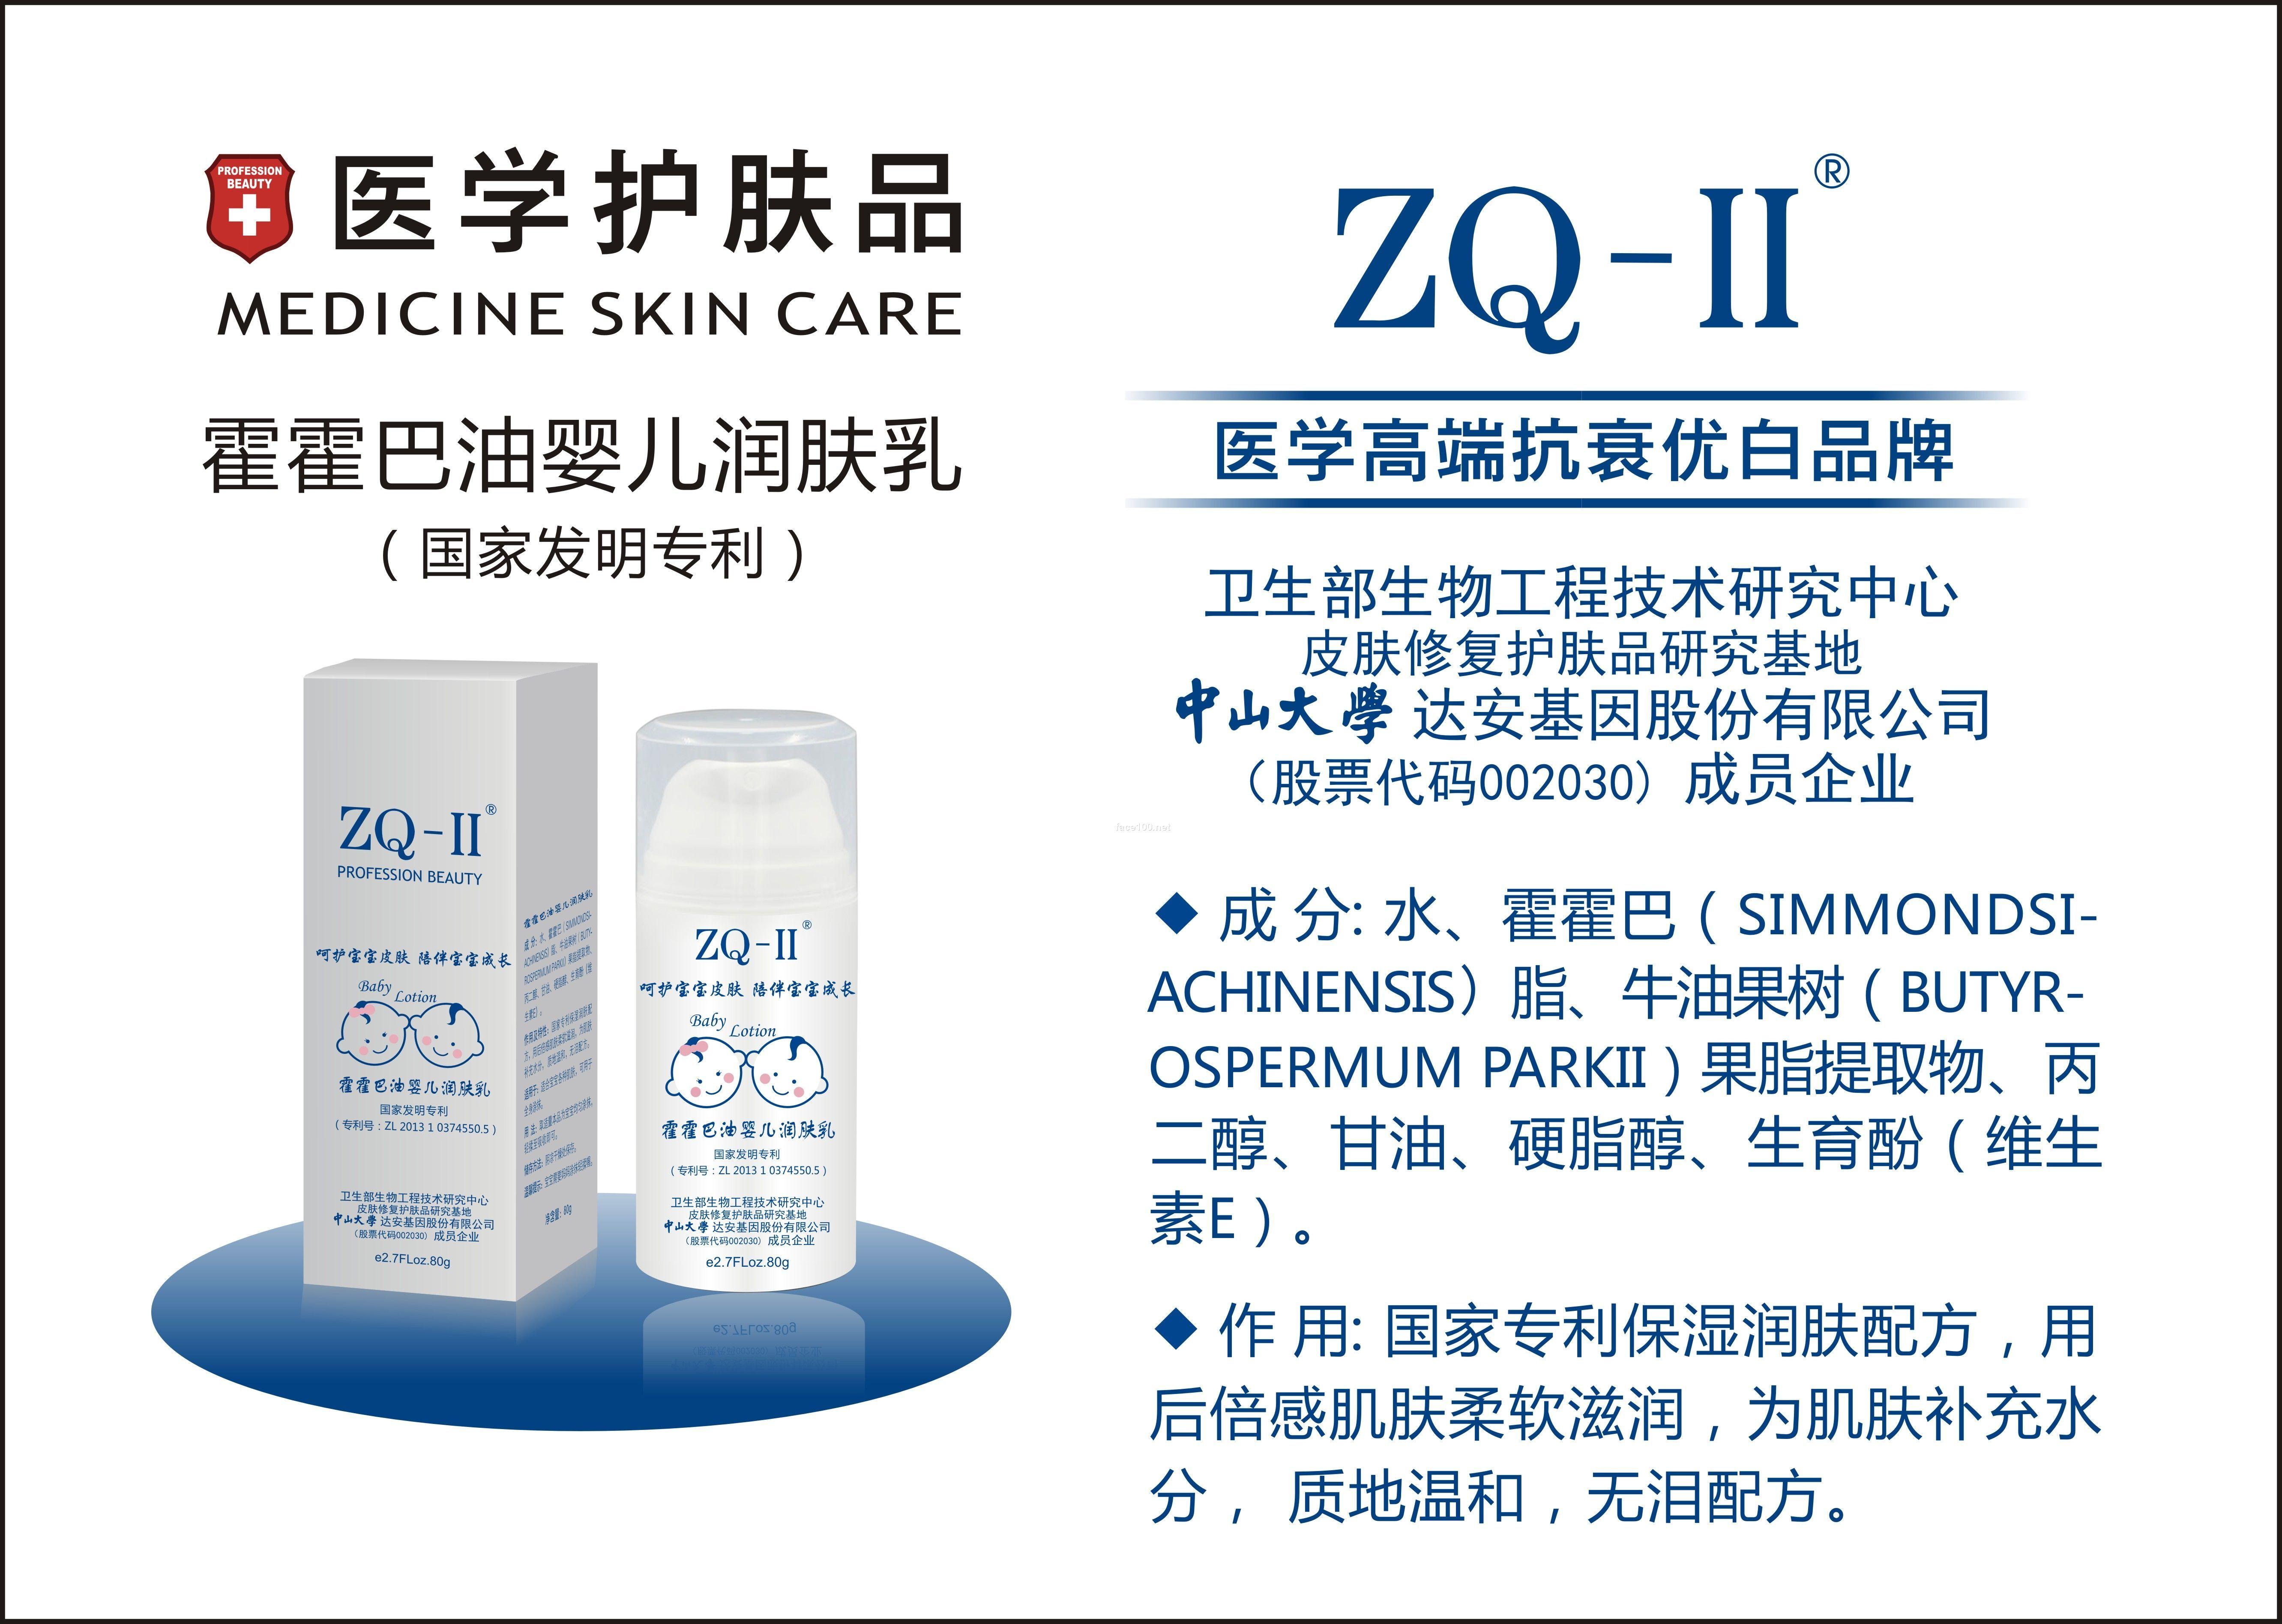 ZQ-II霍霍巴油婴儿润肤乳